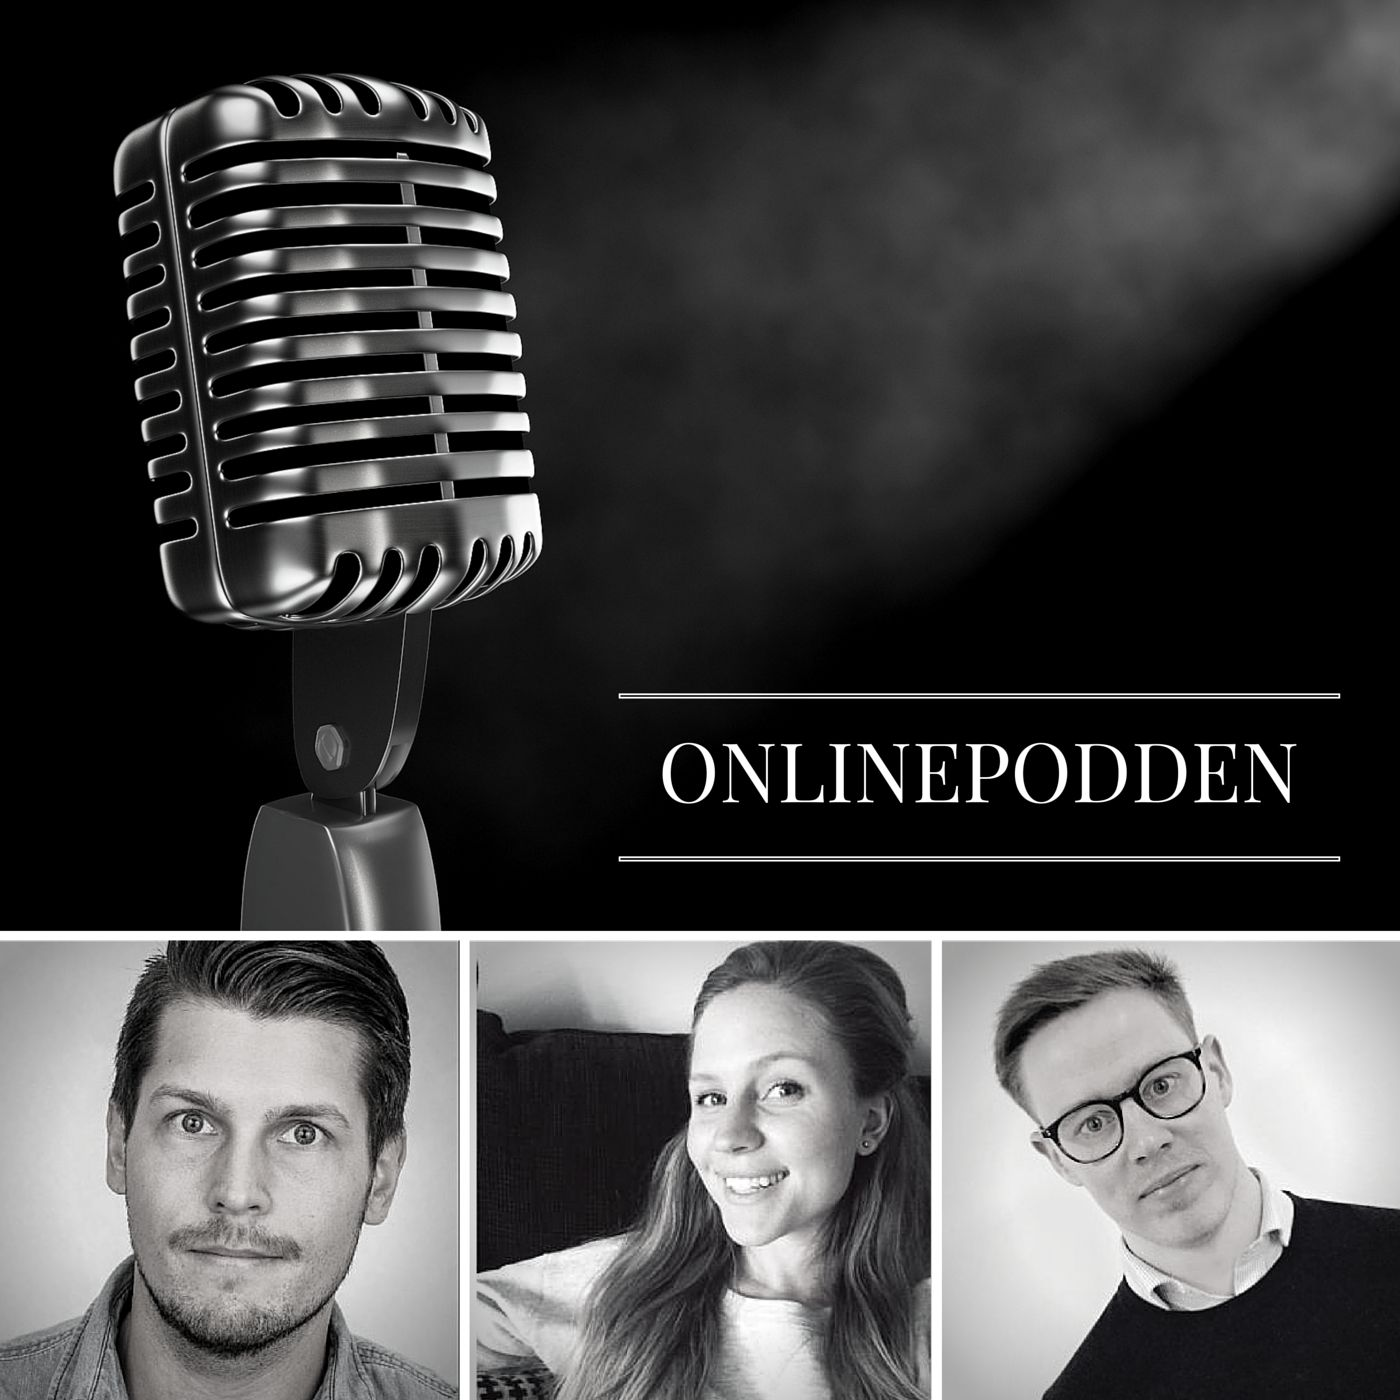 Onlinepodden